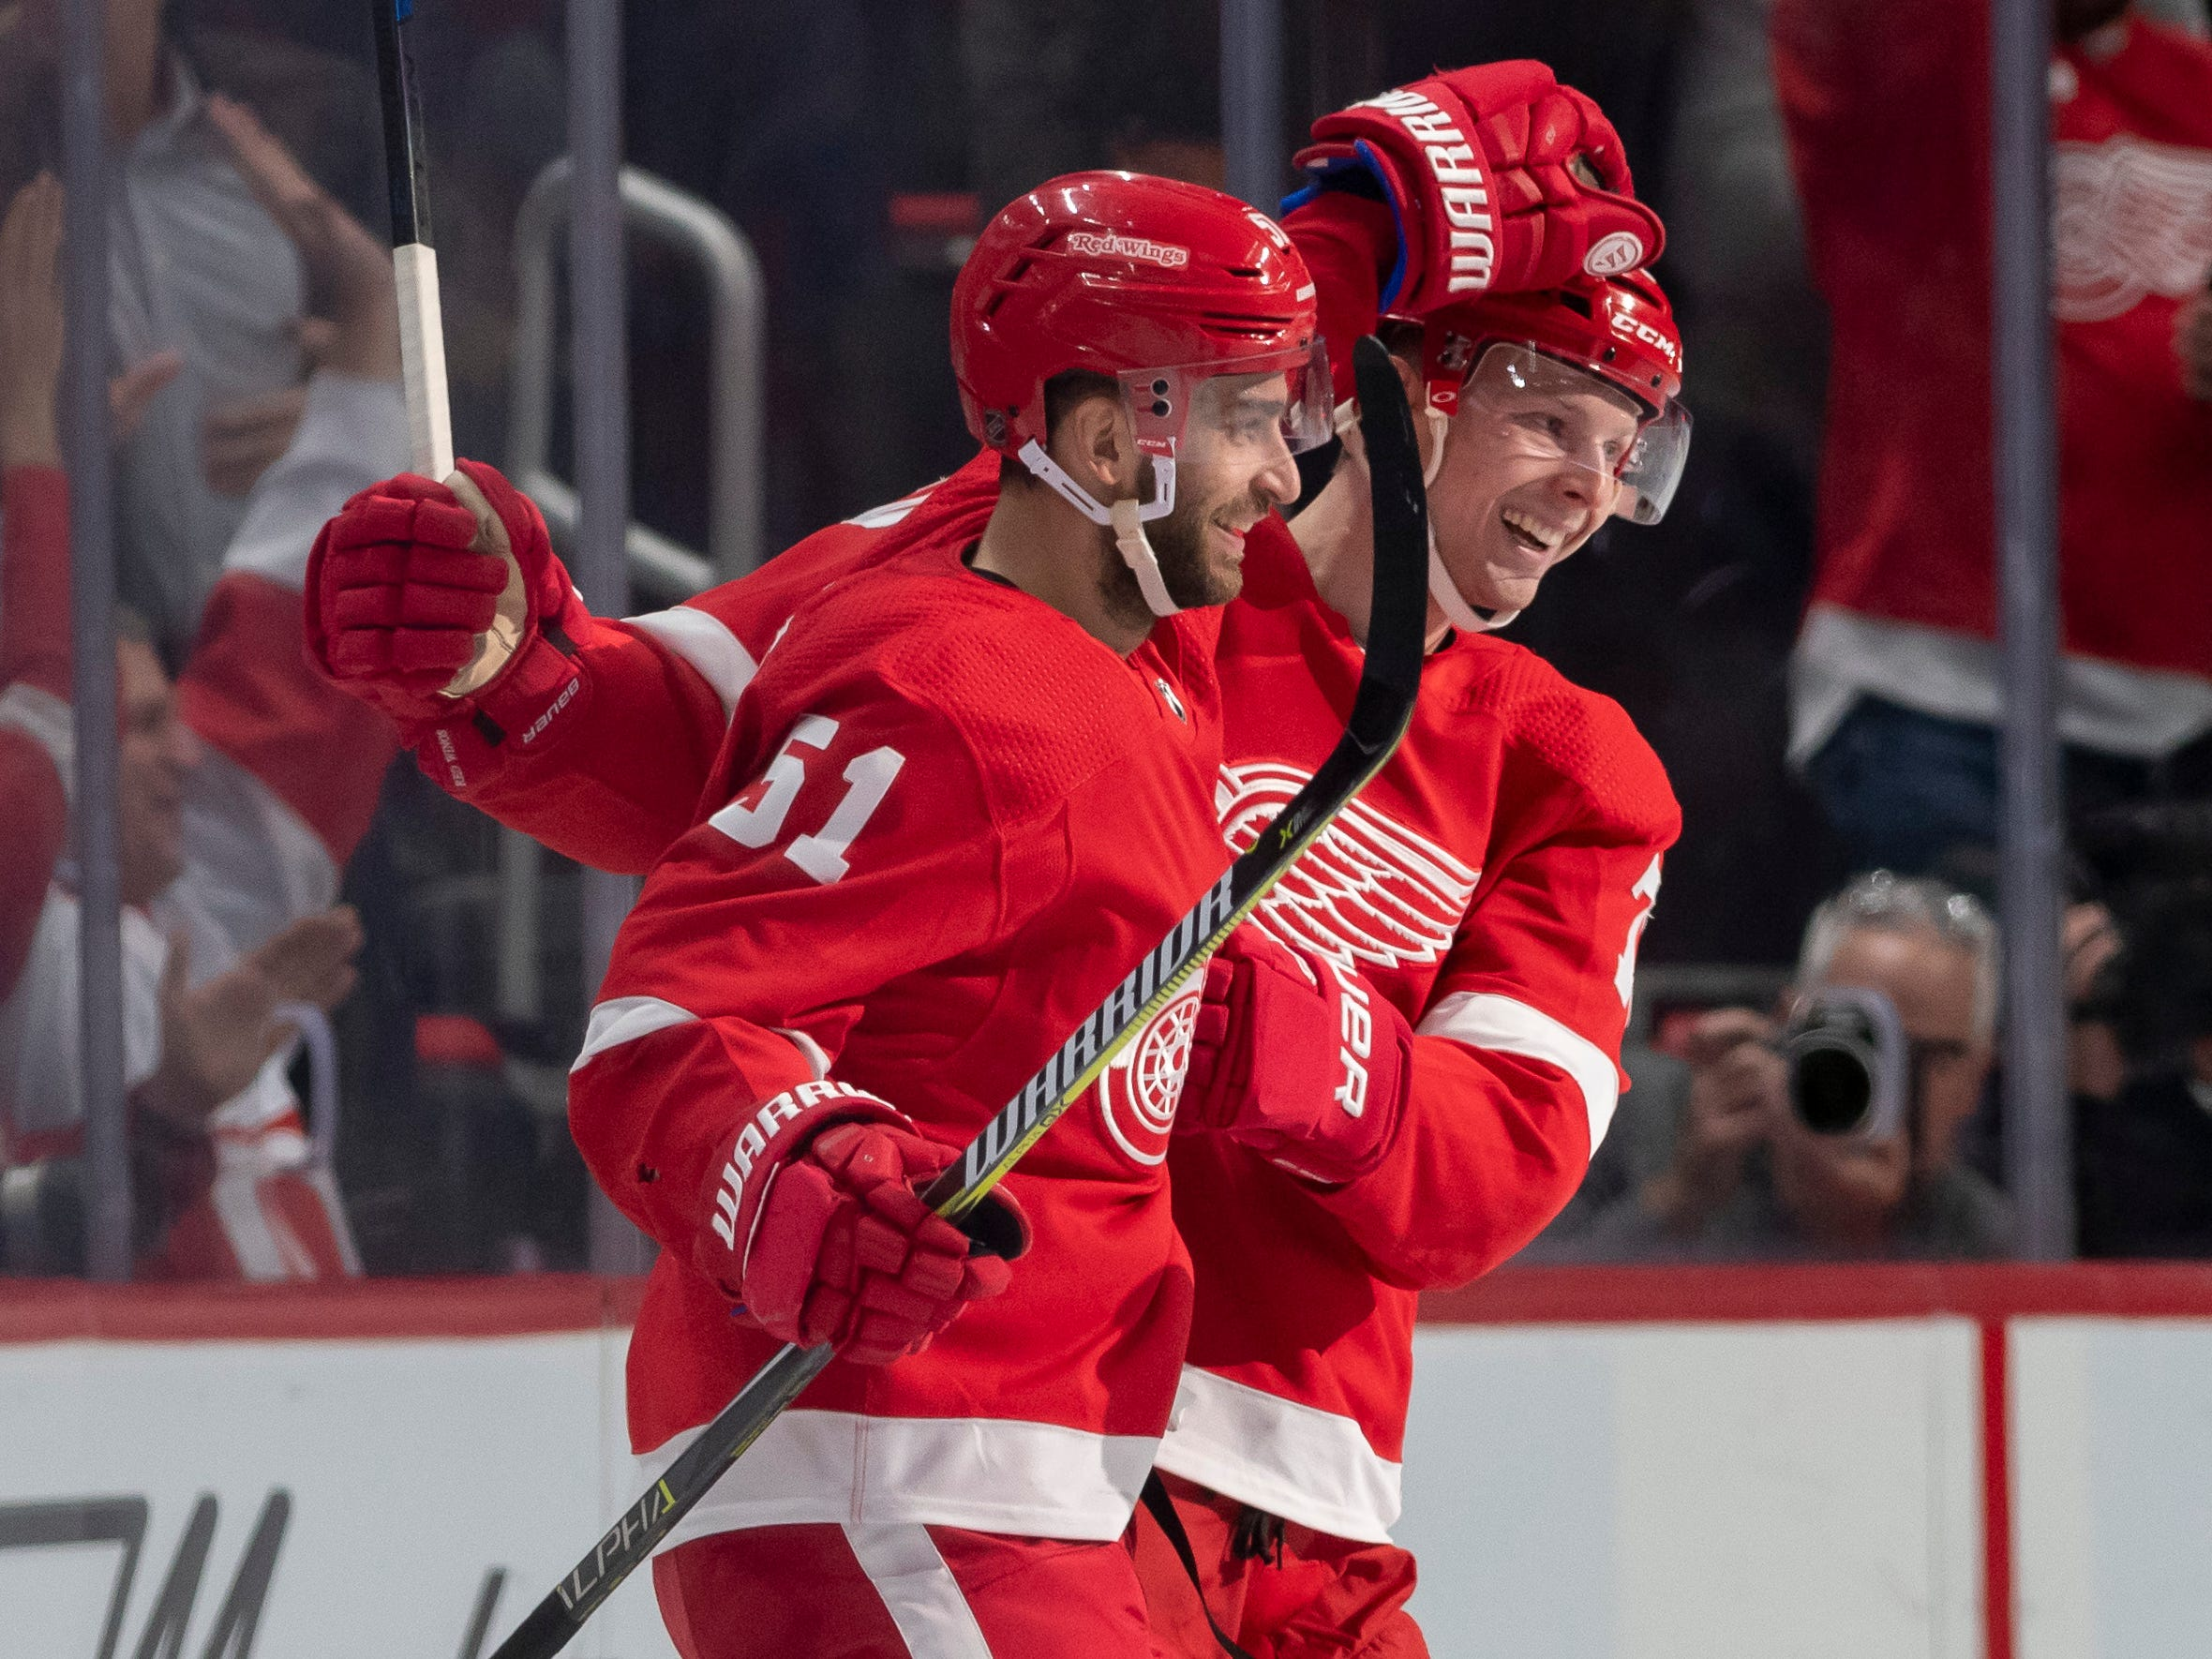 Detroit center Frans Nielsen, left, and center Christoffer Ehn celebrate Nielsen's second goal of the game in the second period.